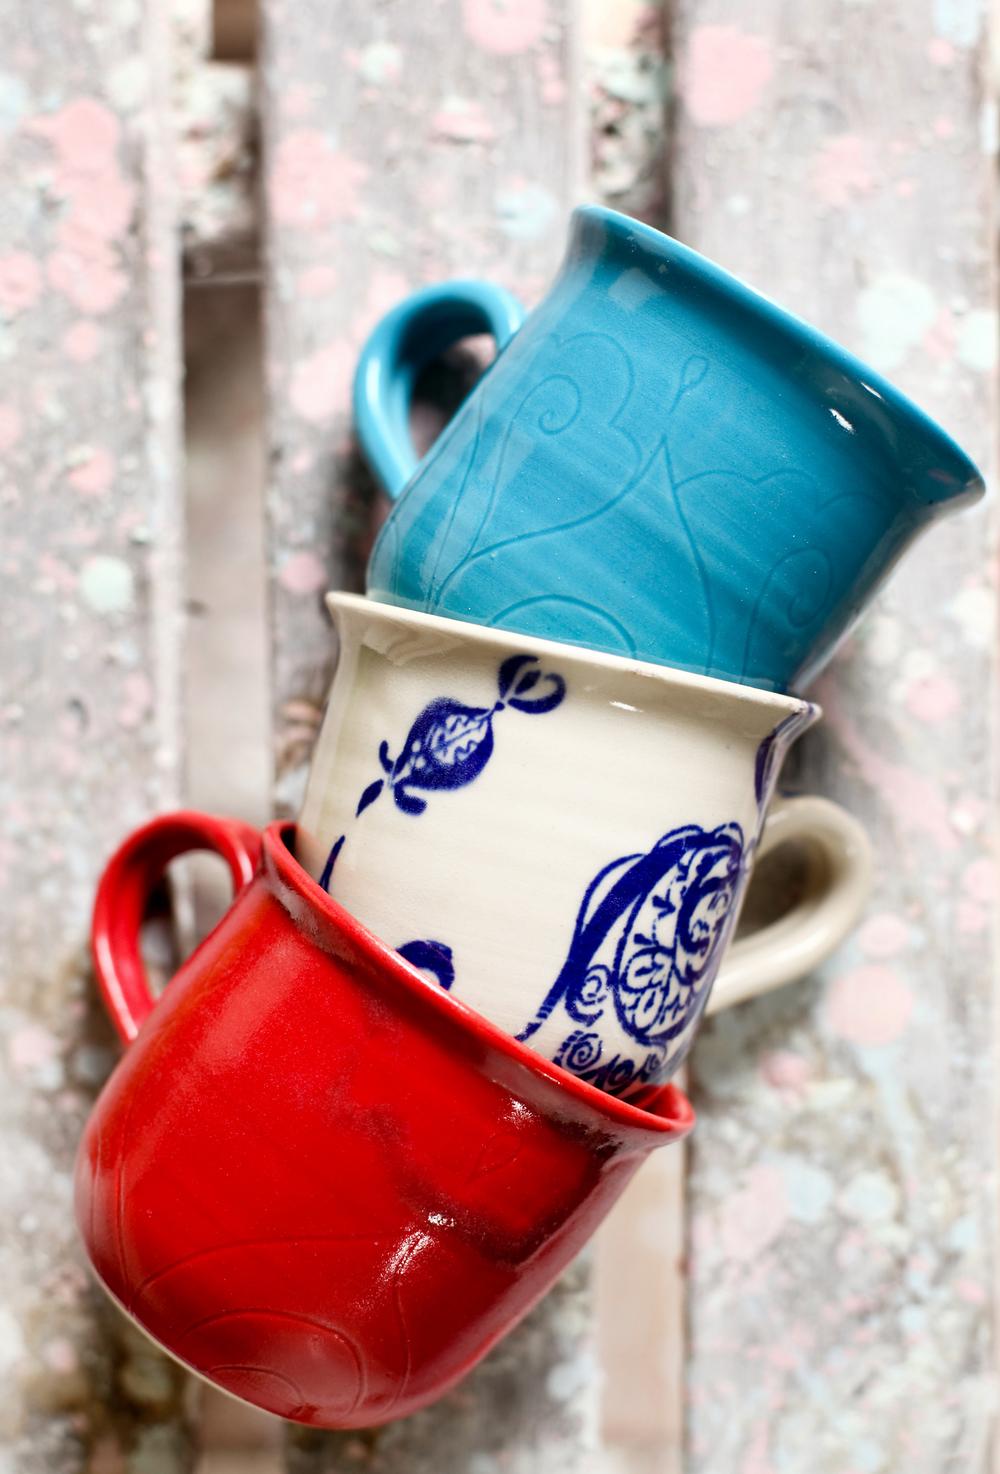 Medium Cups_061_LR.JPG